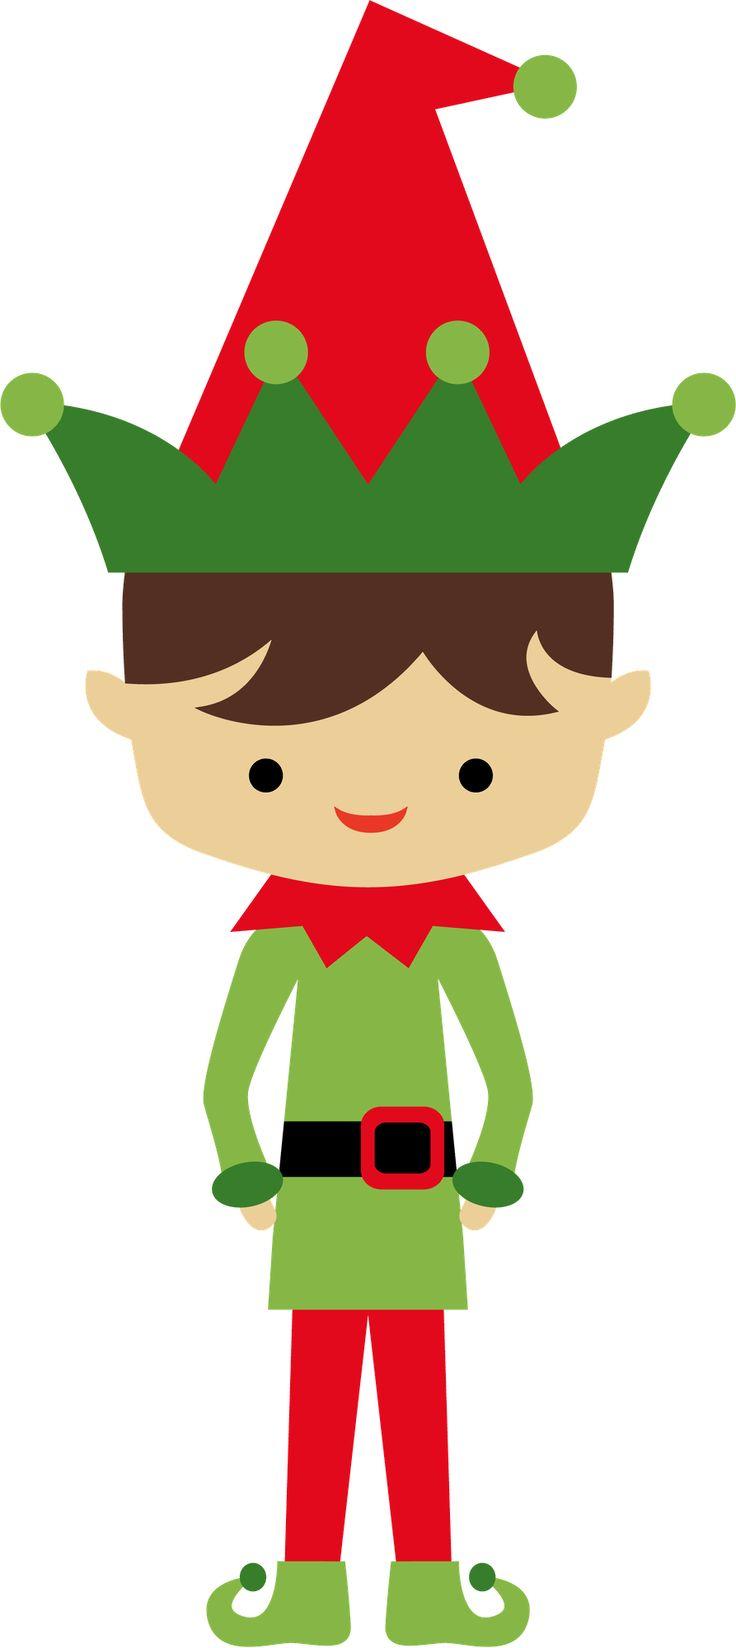 Elf head clipart